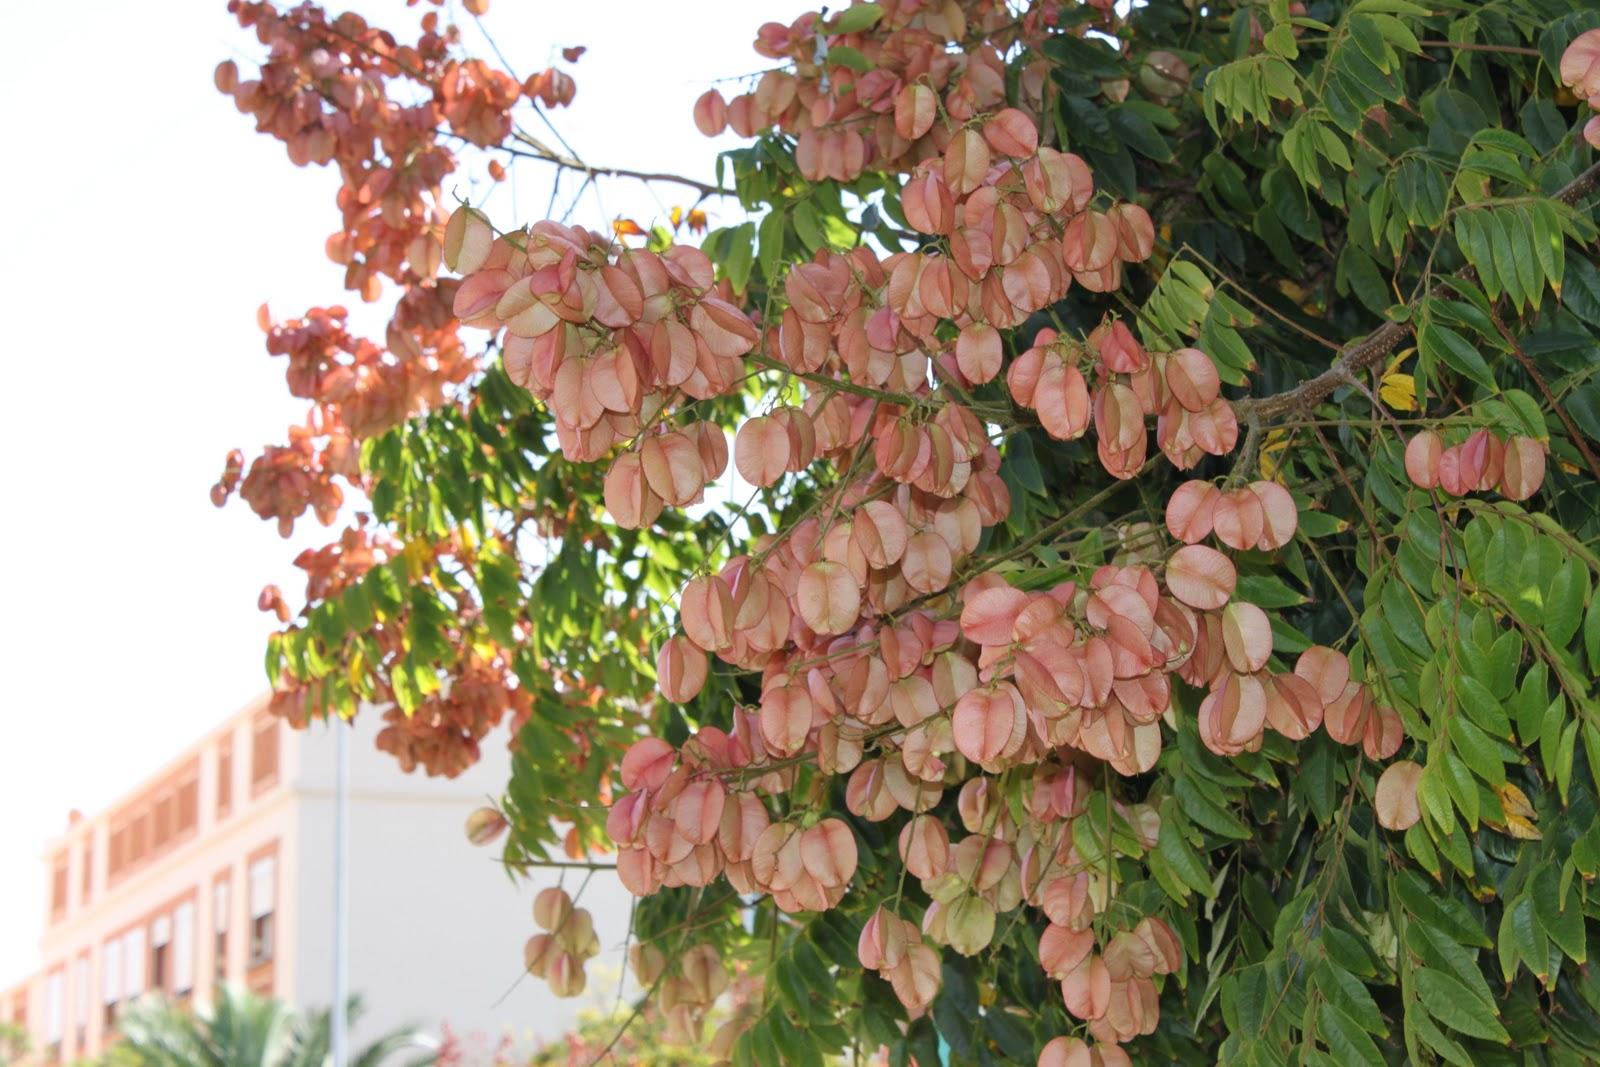 Koelreuteriapaniculata